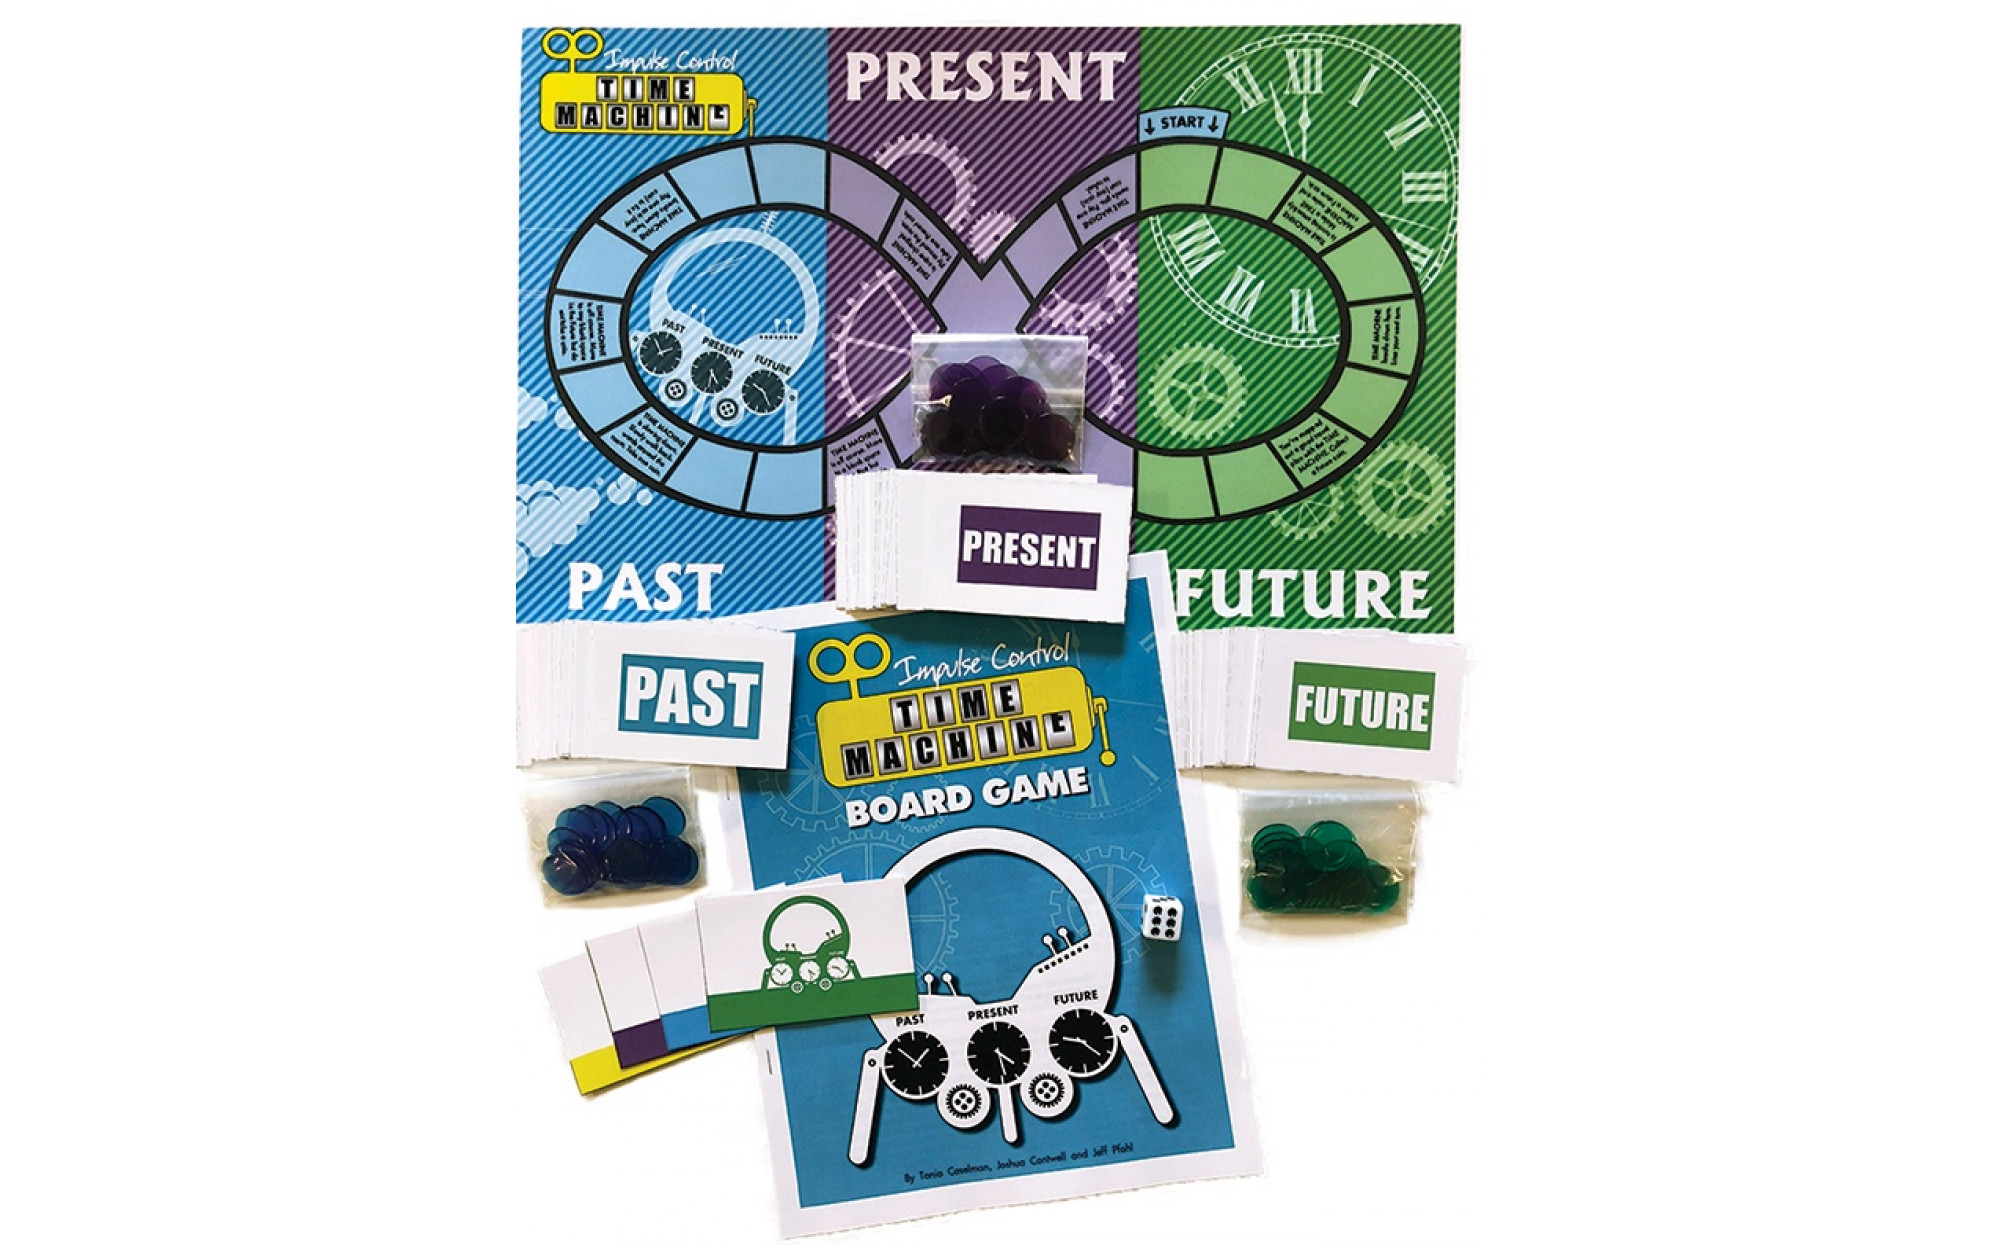 Impulse Control Time Machine Board Game Games